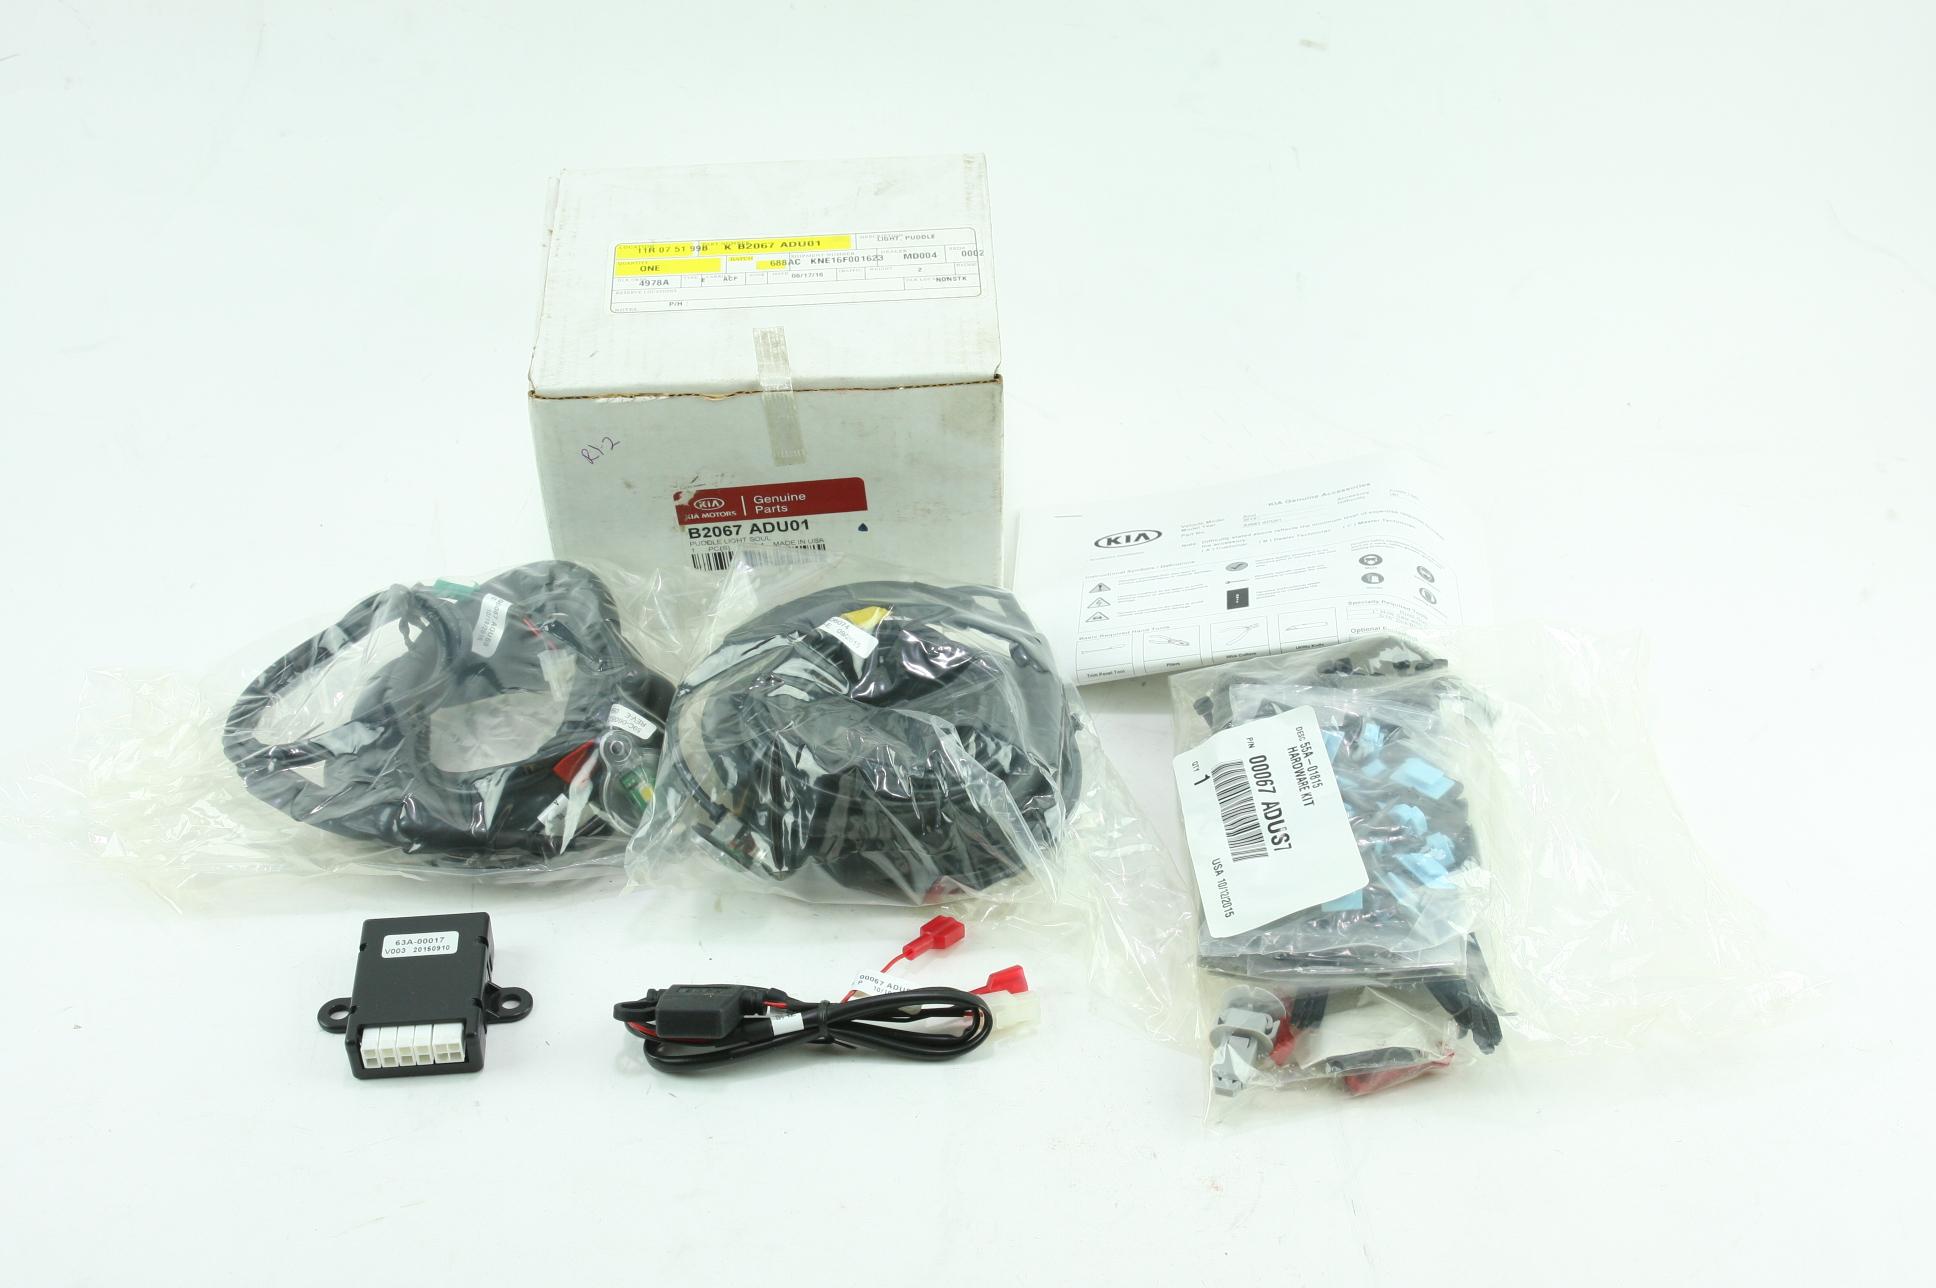 ** Genuine Kia 14-19 Soul Exterior LED Lighting Kit New OEM Packaging B2067ADU01 - image 1